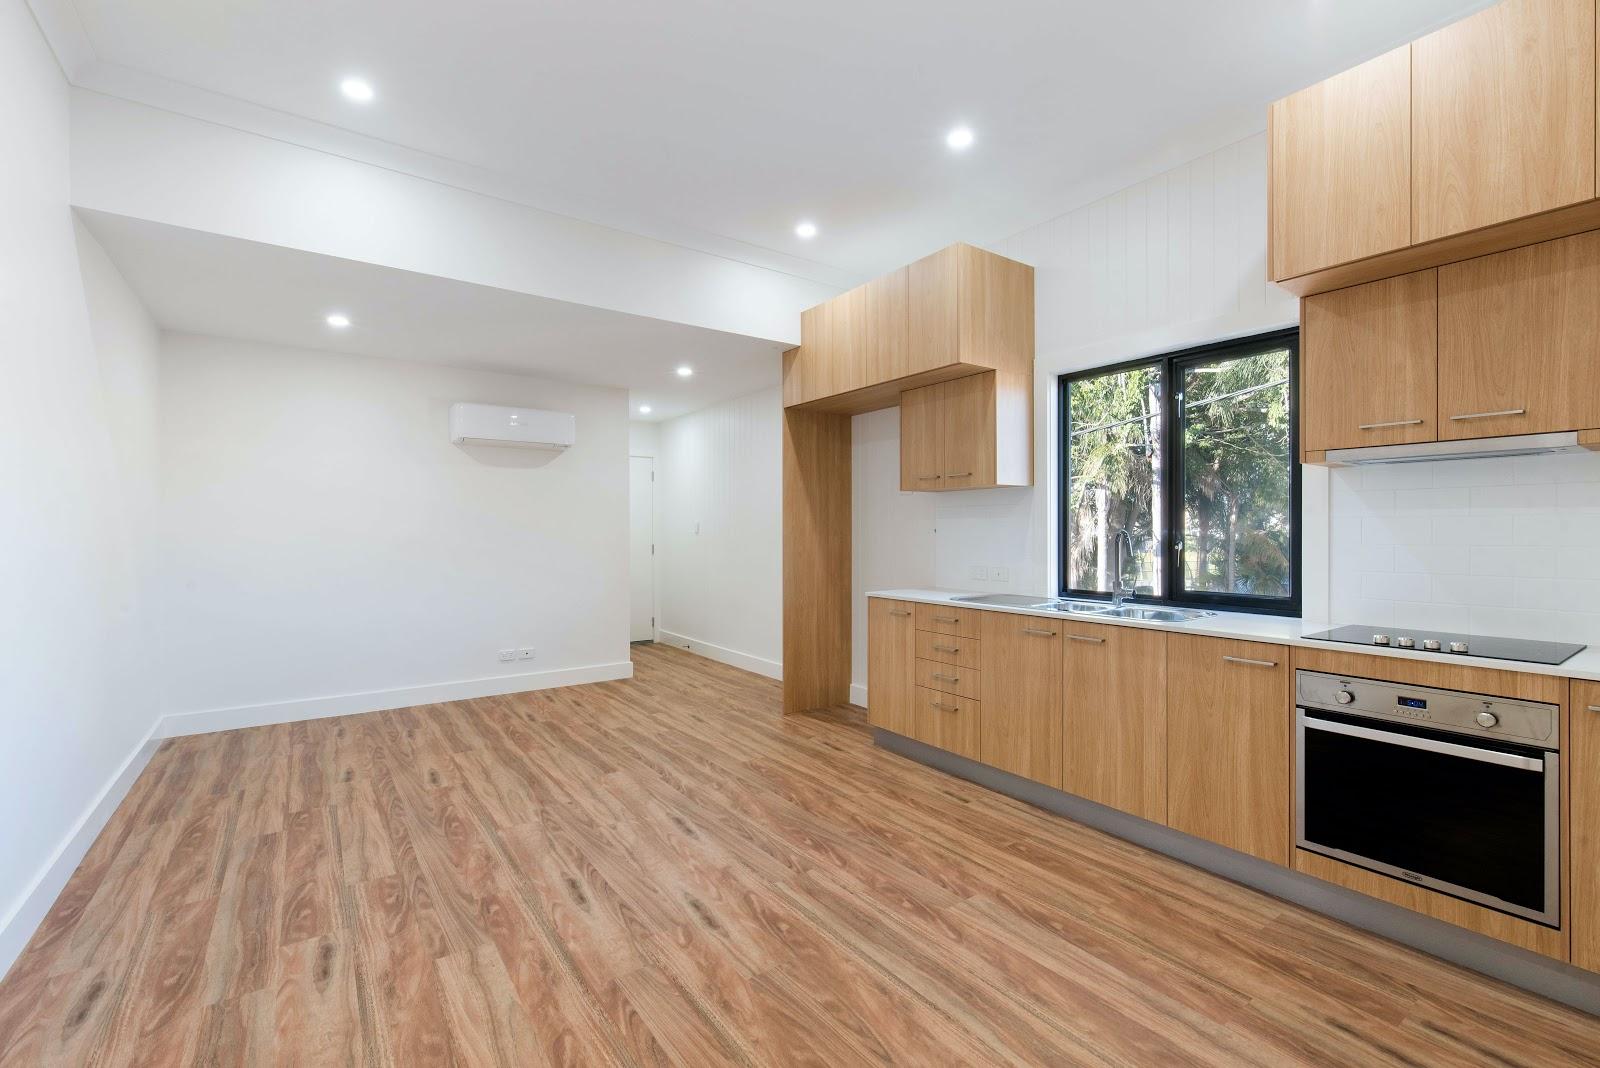 Empty kitchen with wood floors